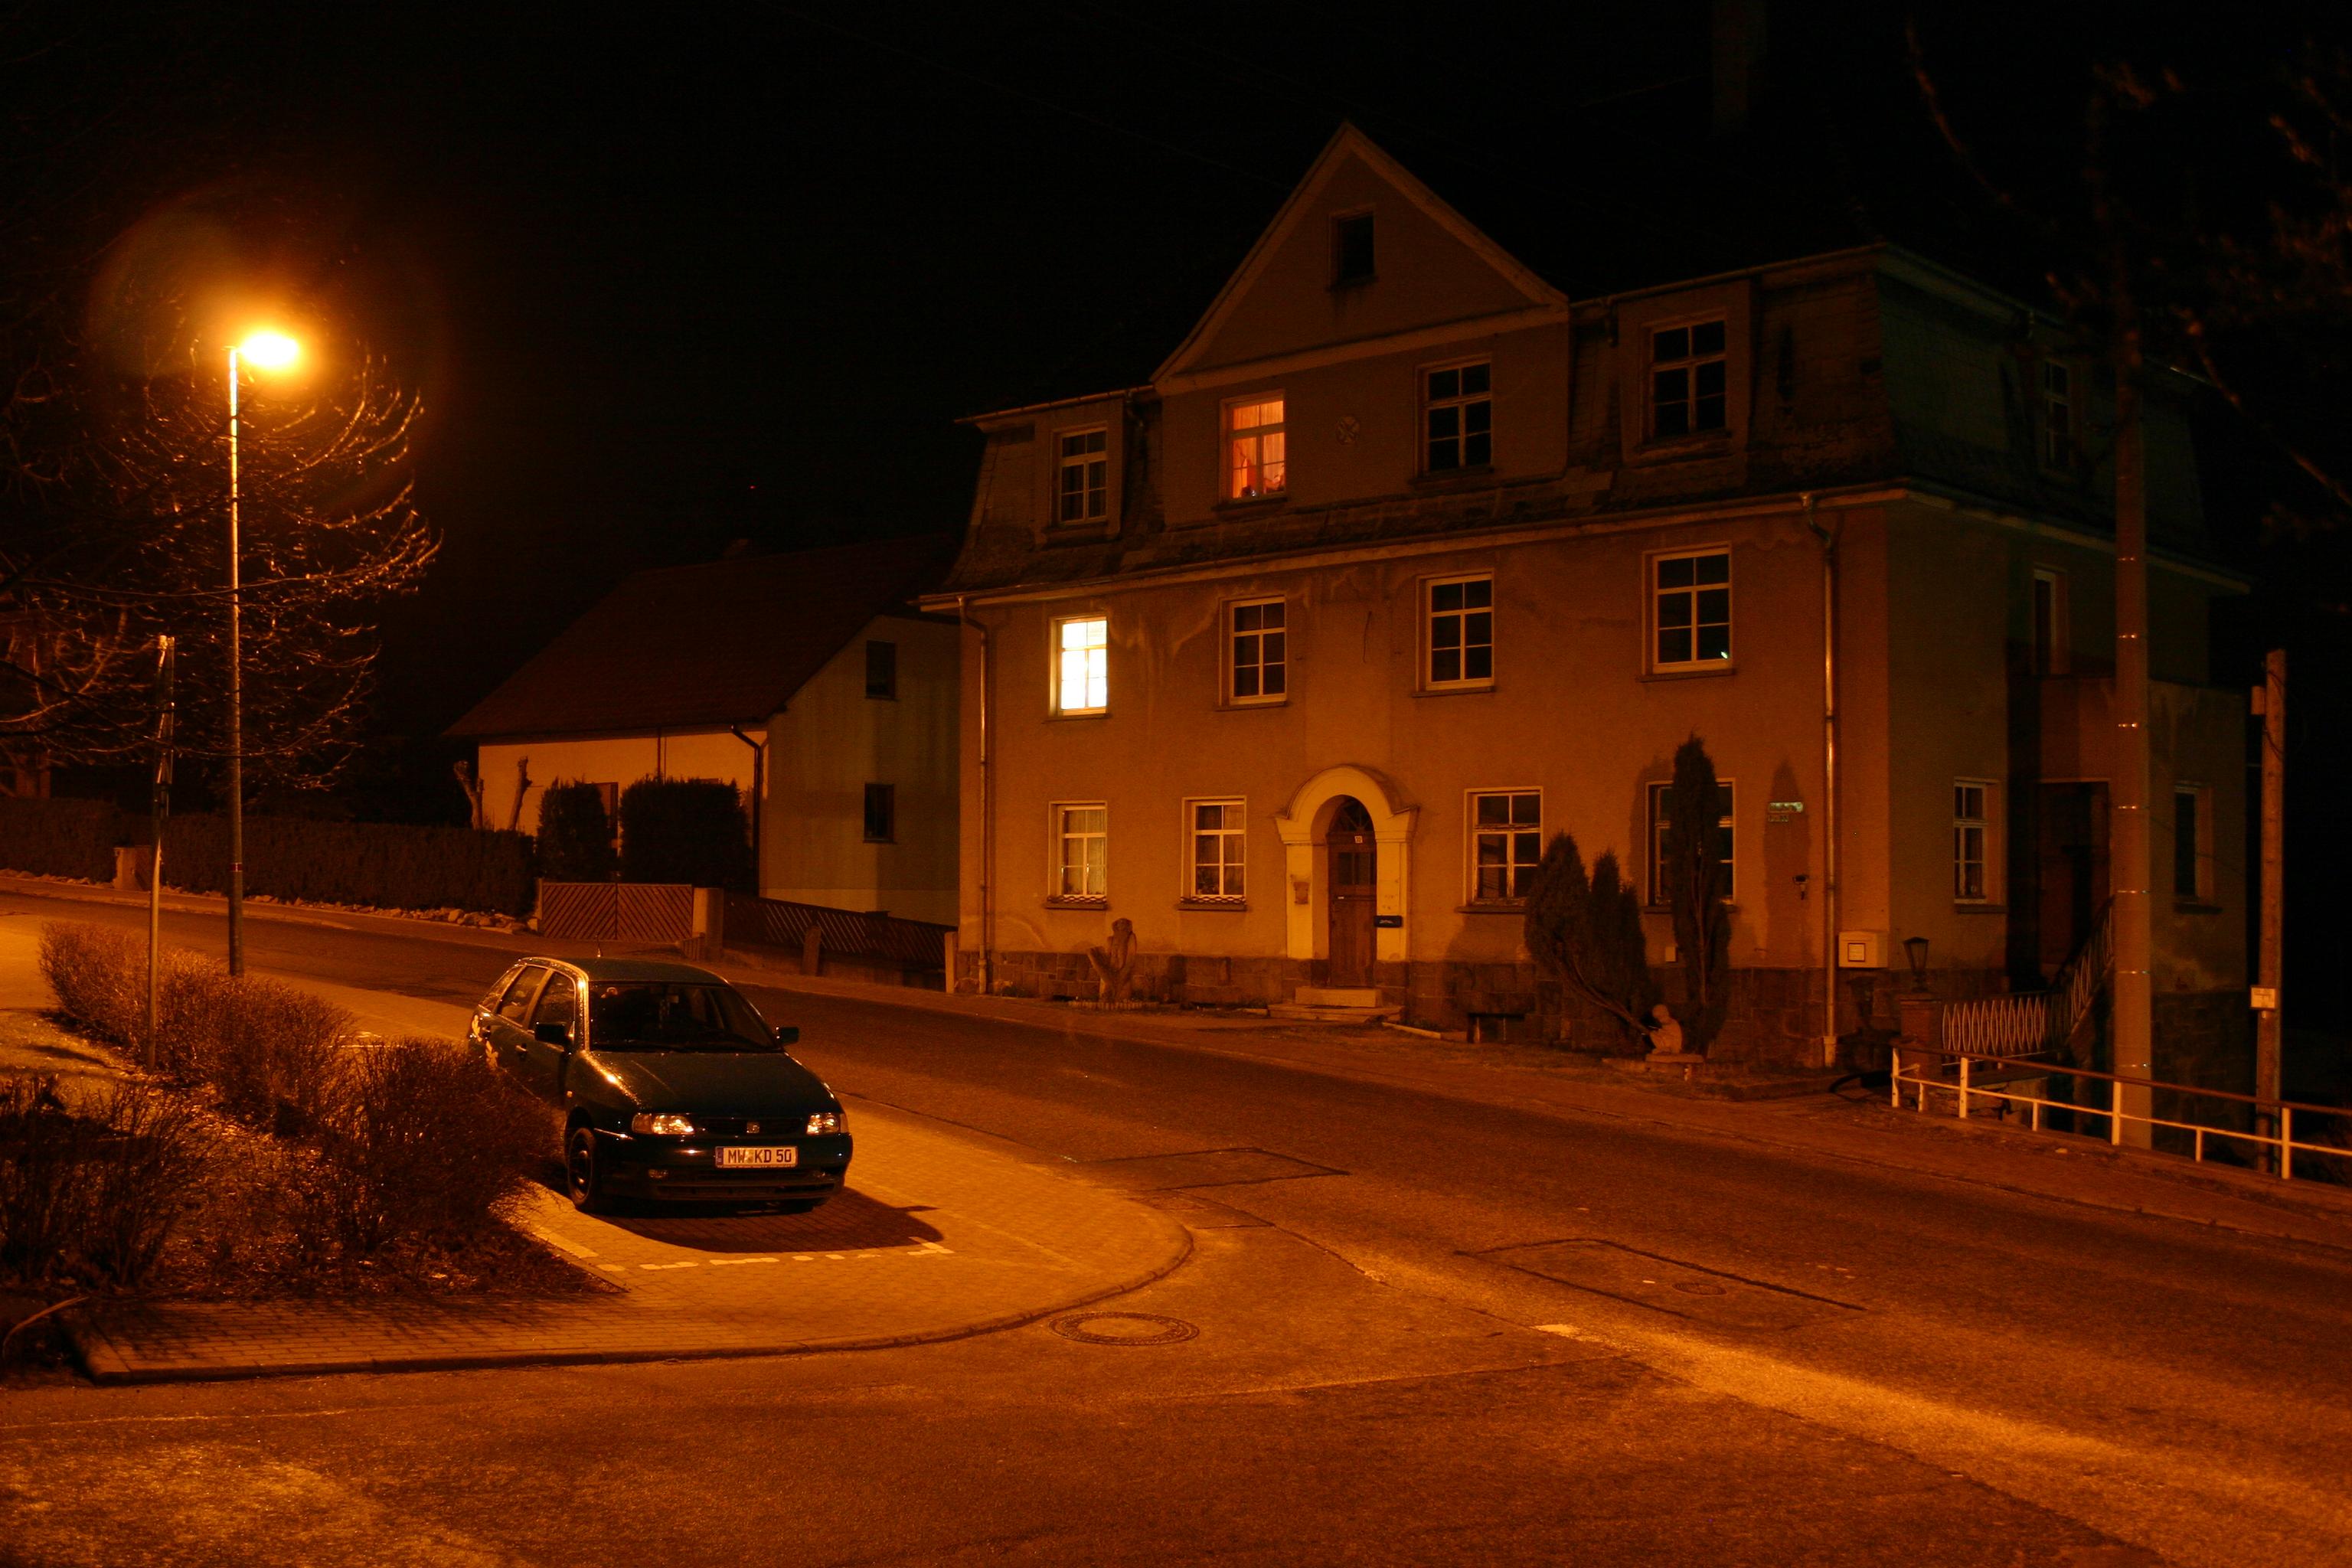 5.) Göritzhain ehem.Rathaus  02.08